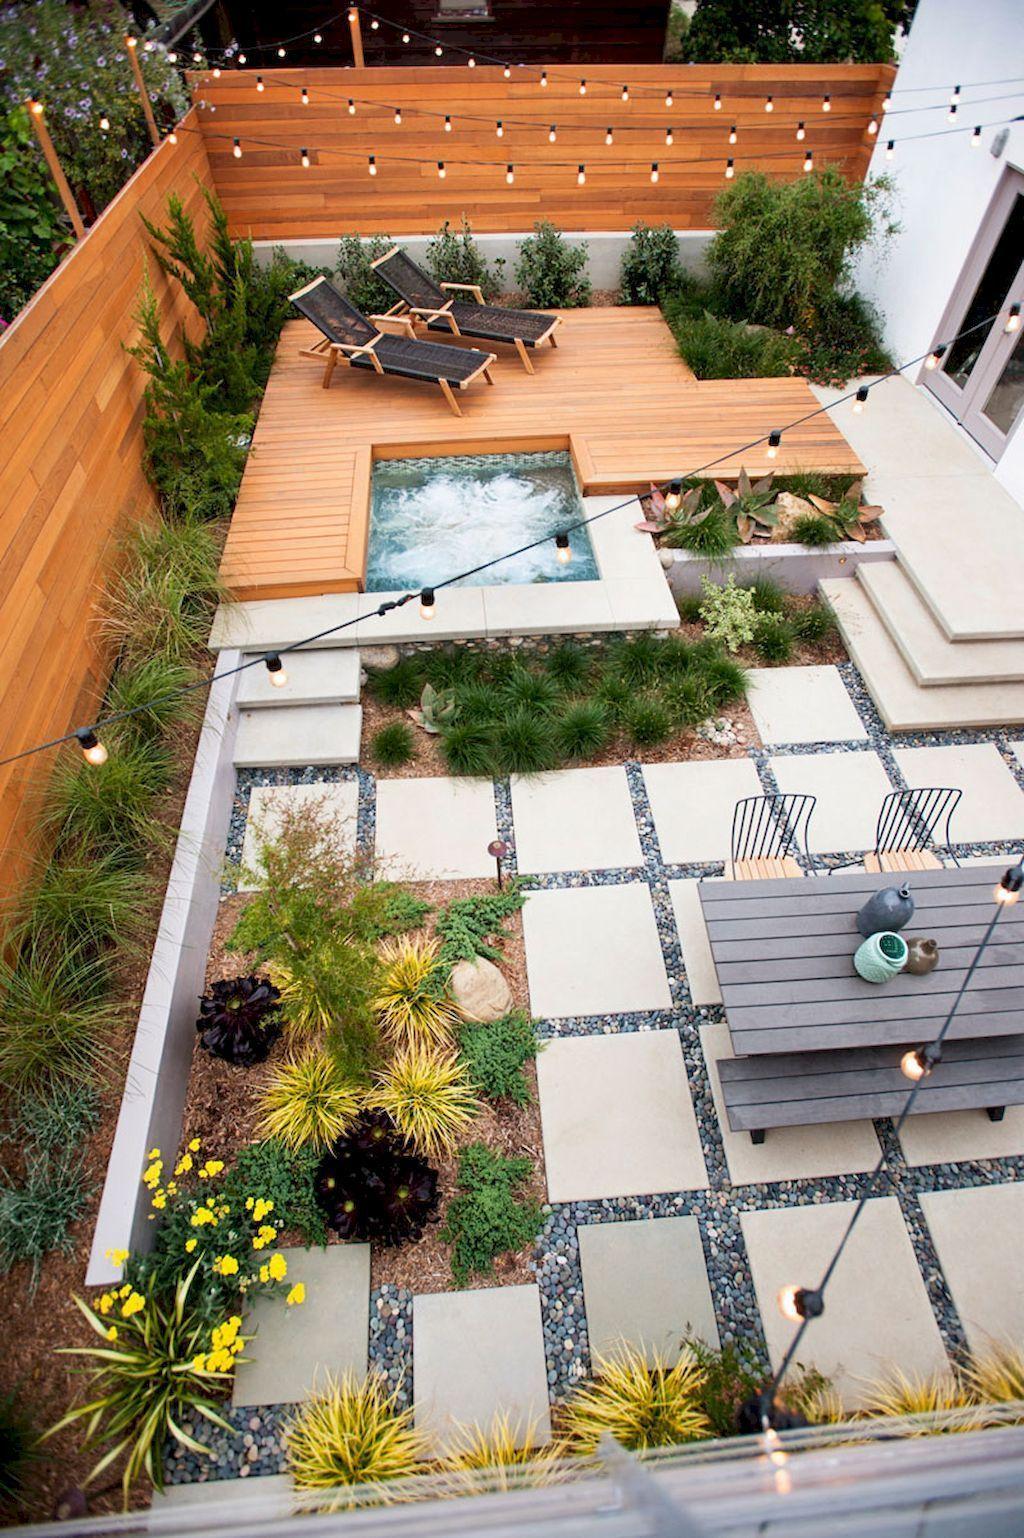 43 Awesome Large Backyard Ideas On A Budget Backyard Diy Ideas Onabudget Patio Small Backyard Landscaping Backyard Backyard Landscaping Designs Diy backyard landscape design